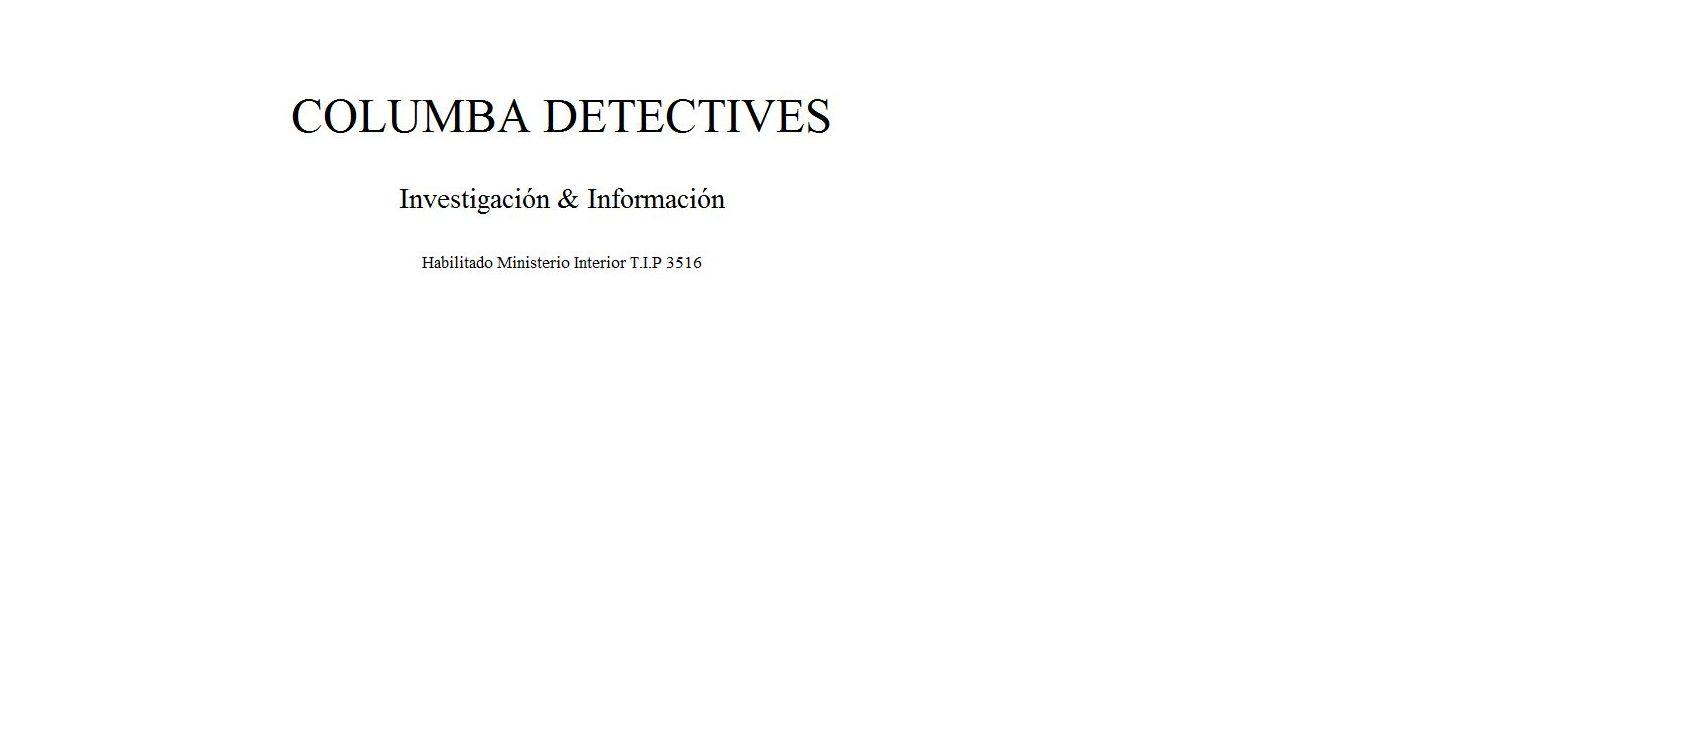 Foto 9 de Detectives privados en sant antoni de portmany | Columba Detectives